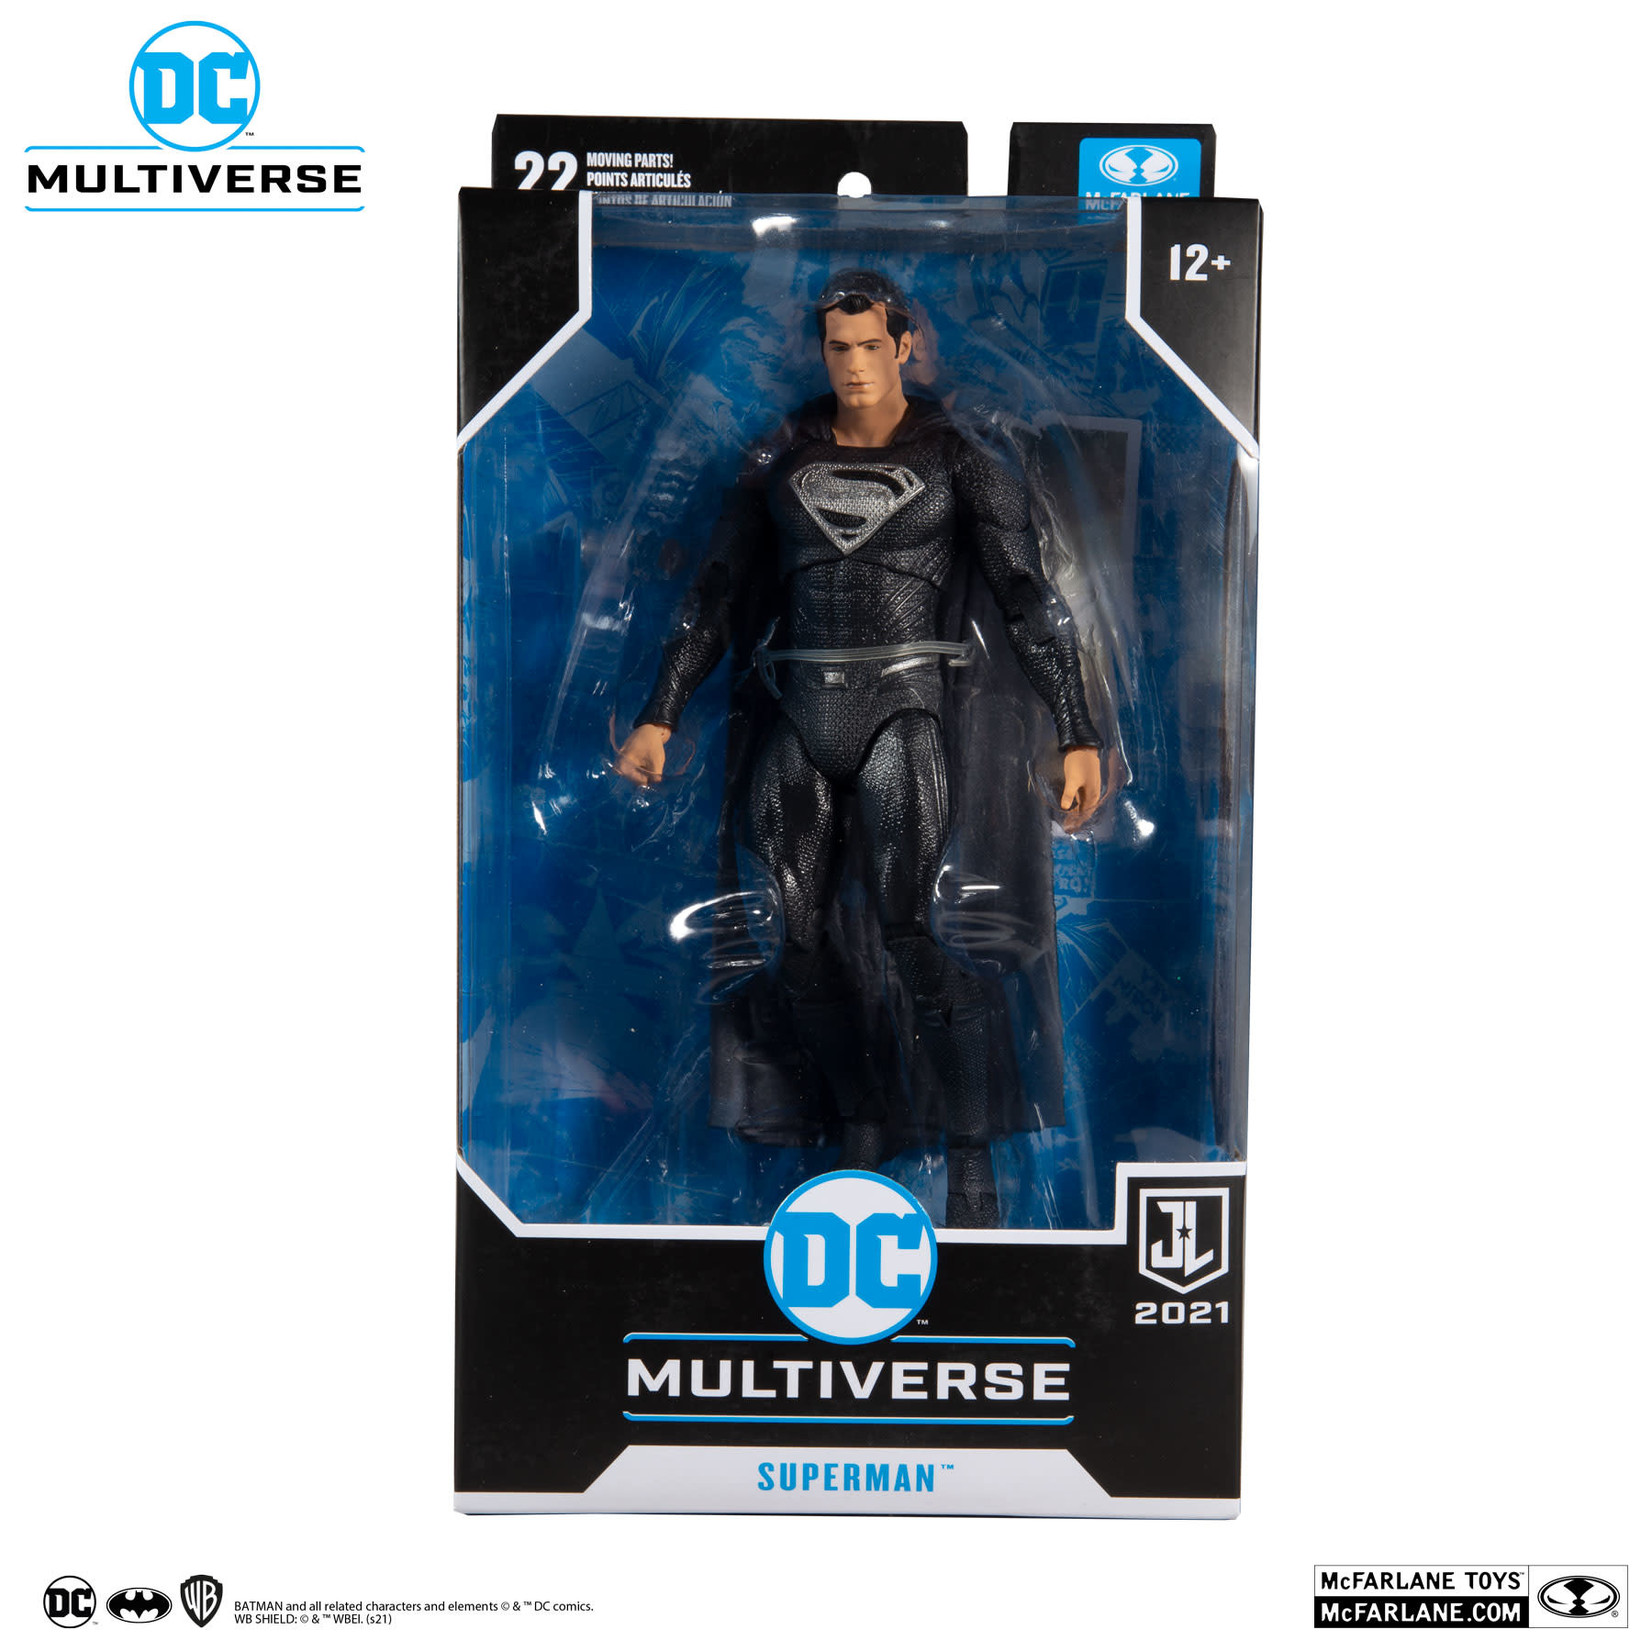 McFarlane Toys DC JUSTICE LEAGUE MOVIE - SUPERMAN